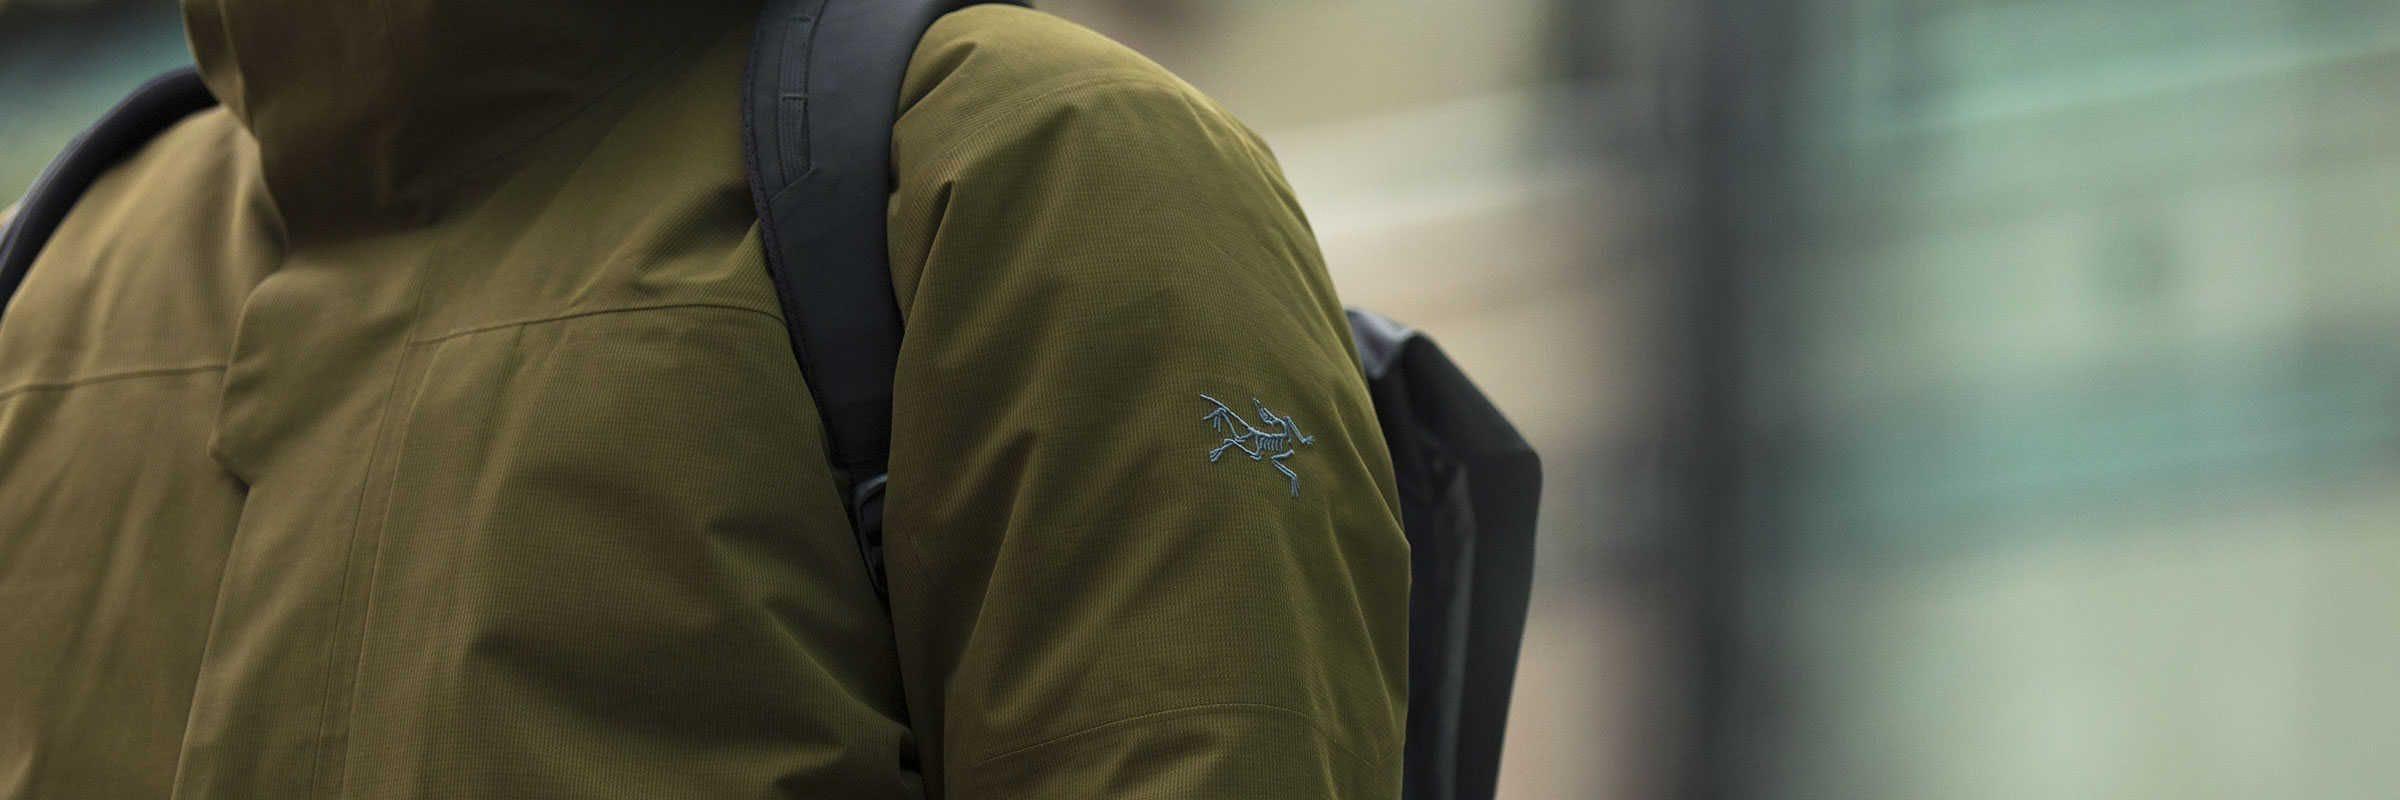 arcteryx mens urban winter coats